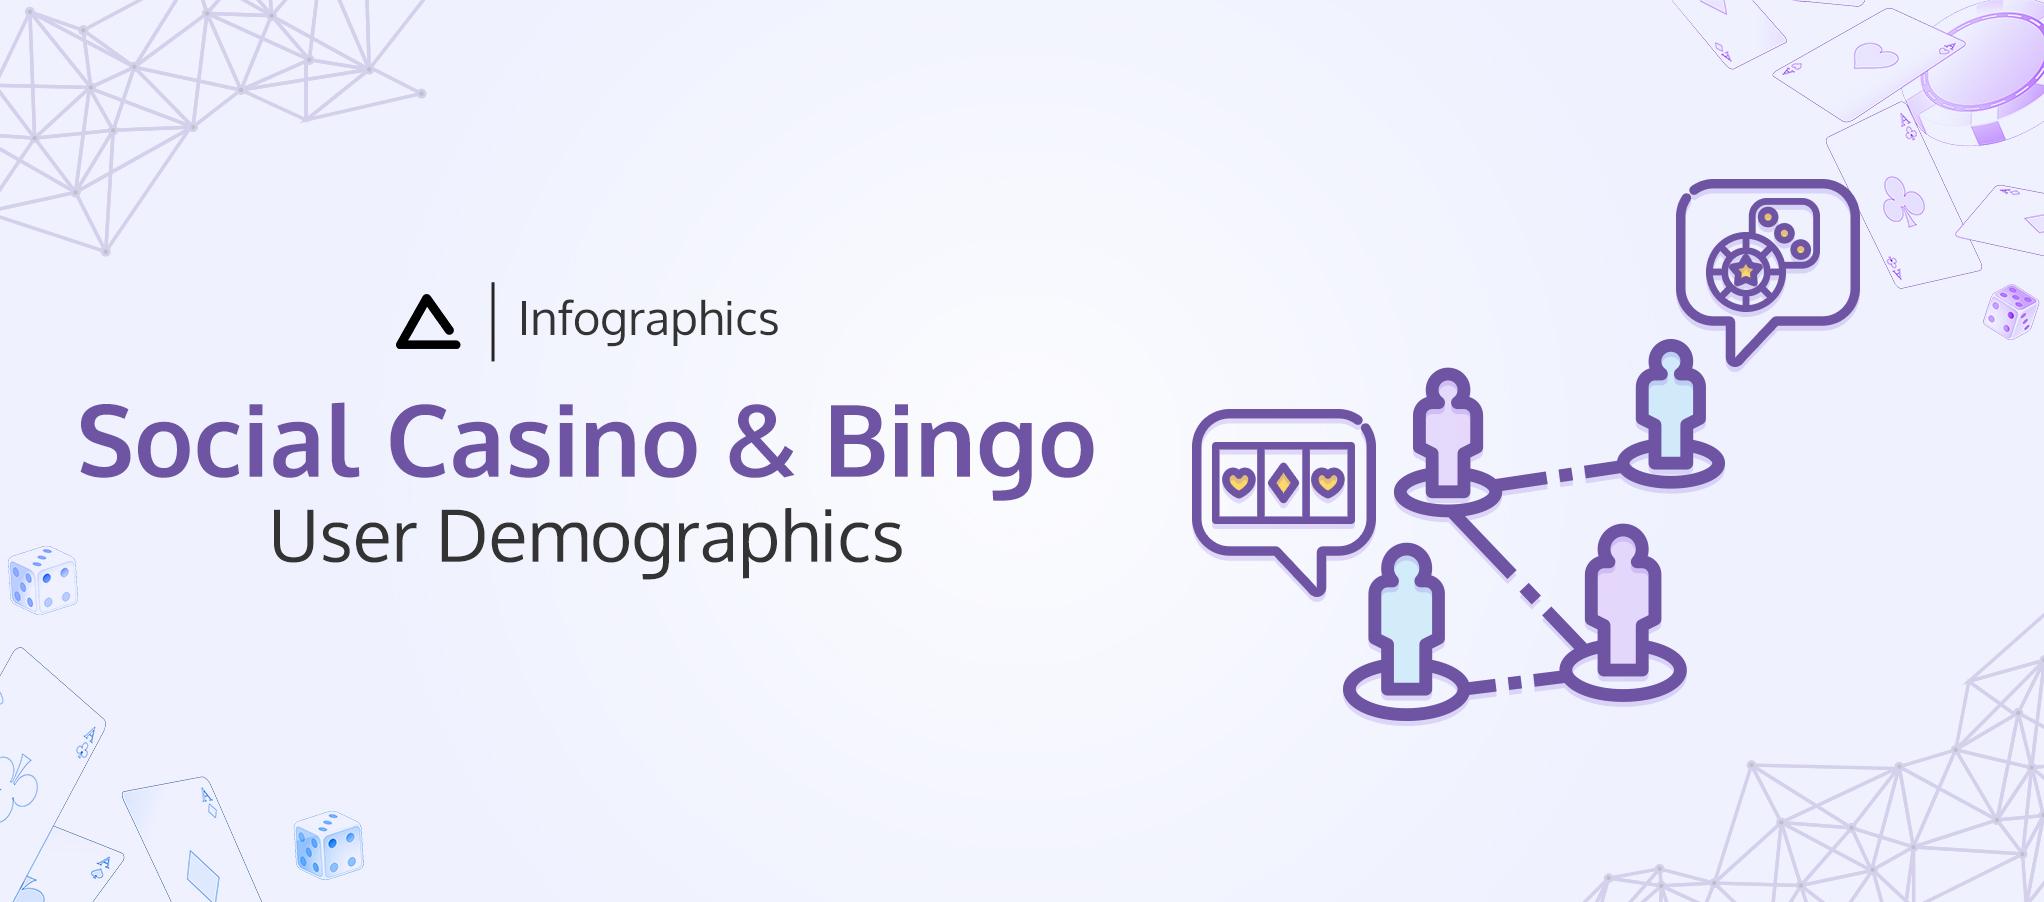 Social casino bingo demographics